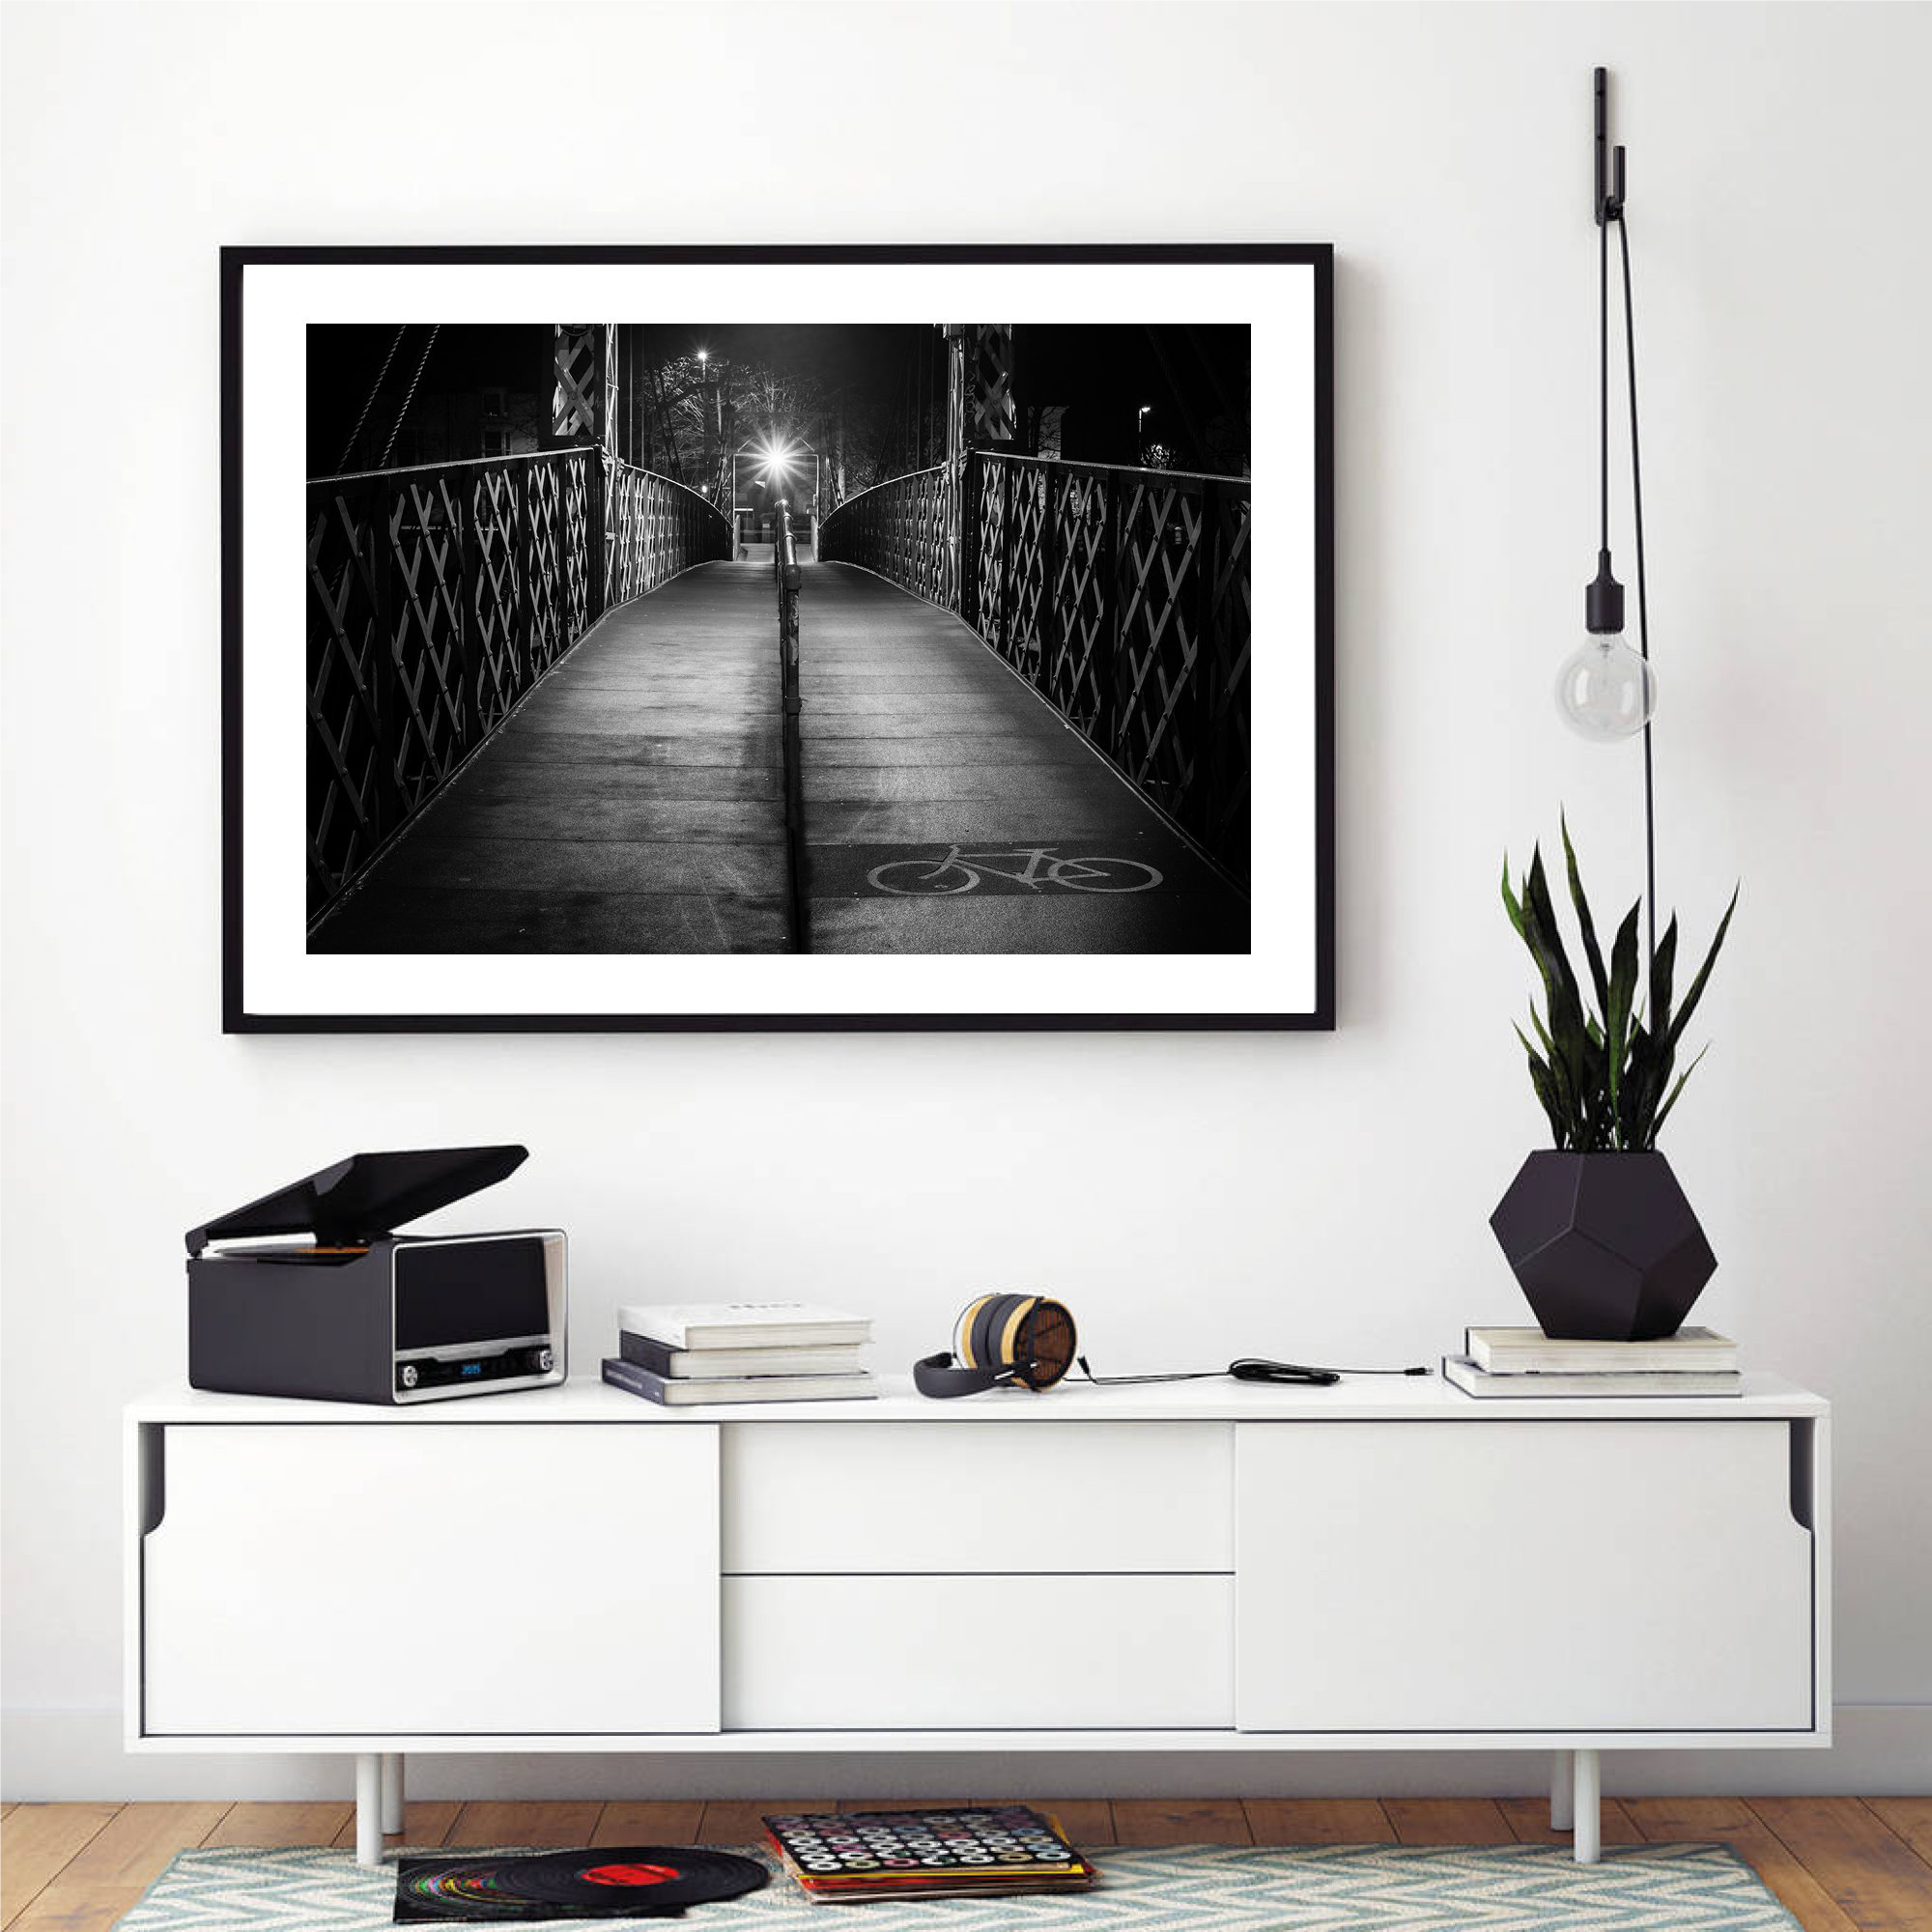 Gaol Ferry Bridge on wall.png